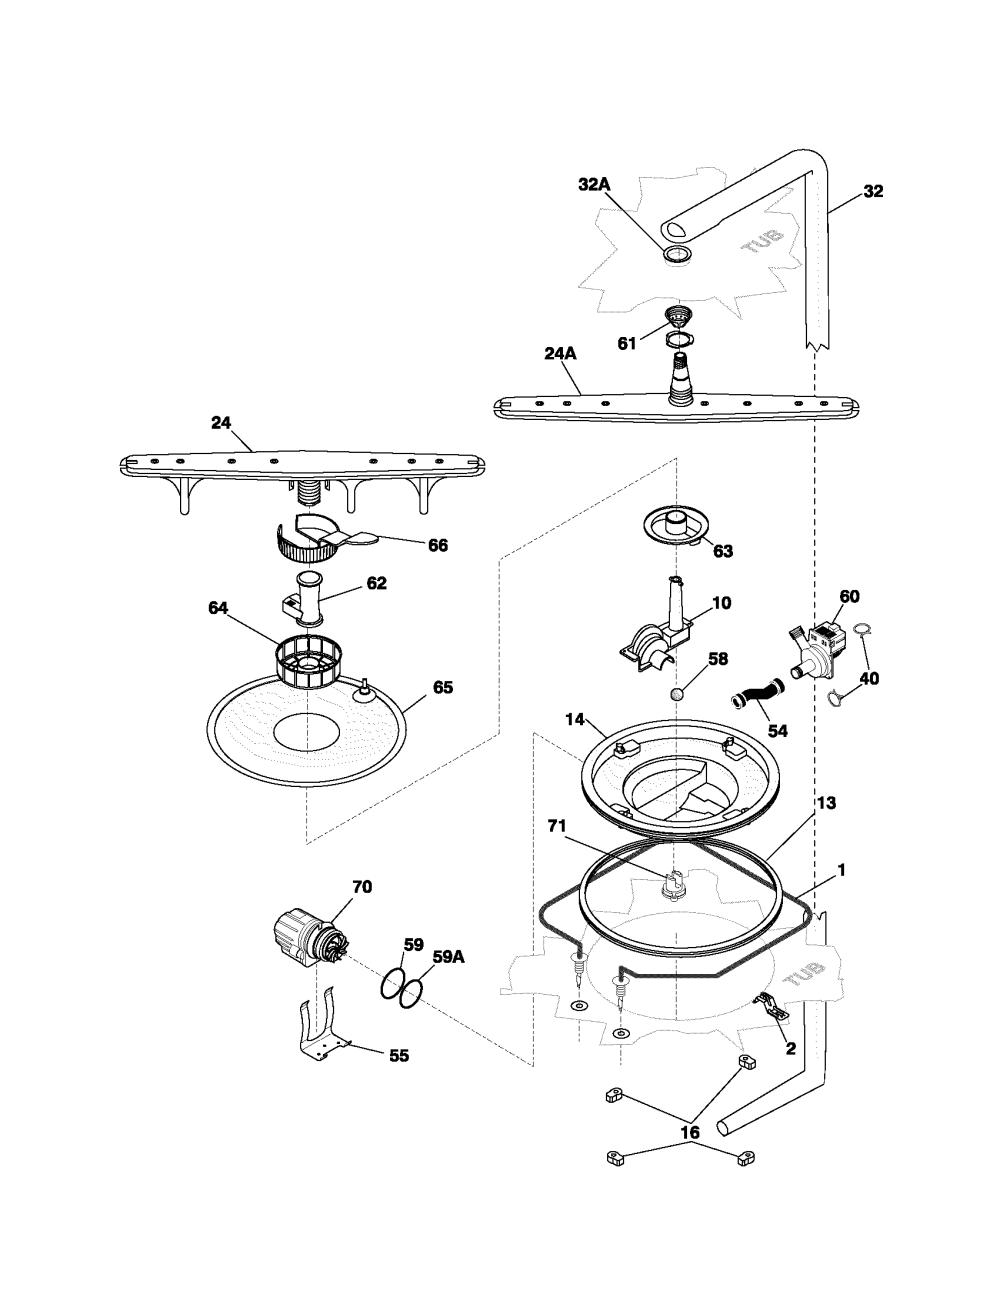 medium resolution of frigidaire model pldb998cc0 dishwasher genuine parts rh searspartsdirect com electrolux dishwasher parts layout electrolux dishwasher problems